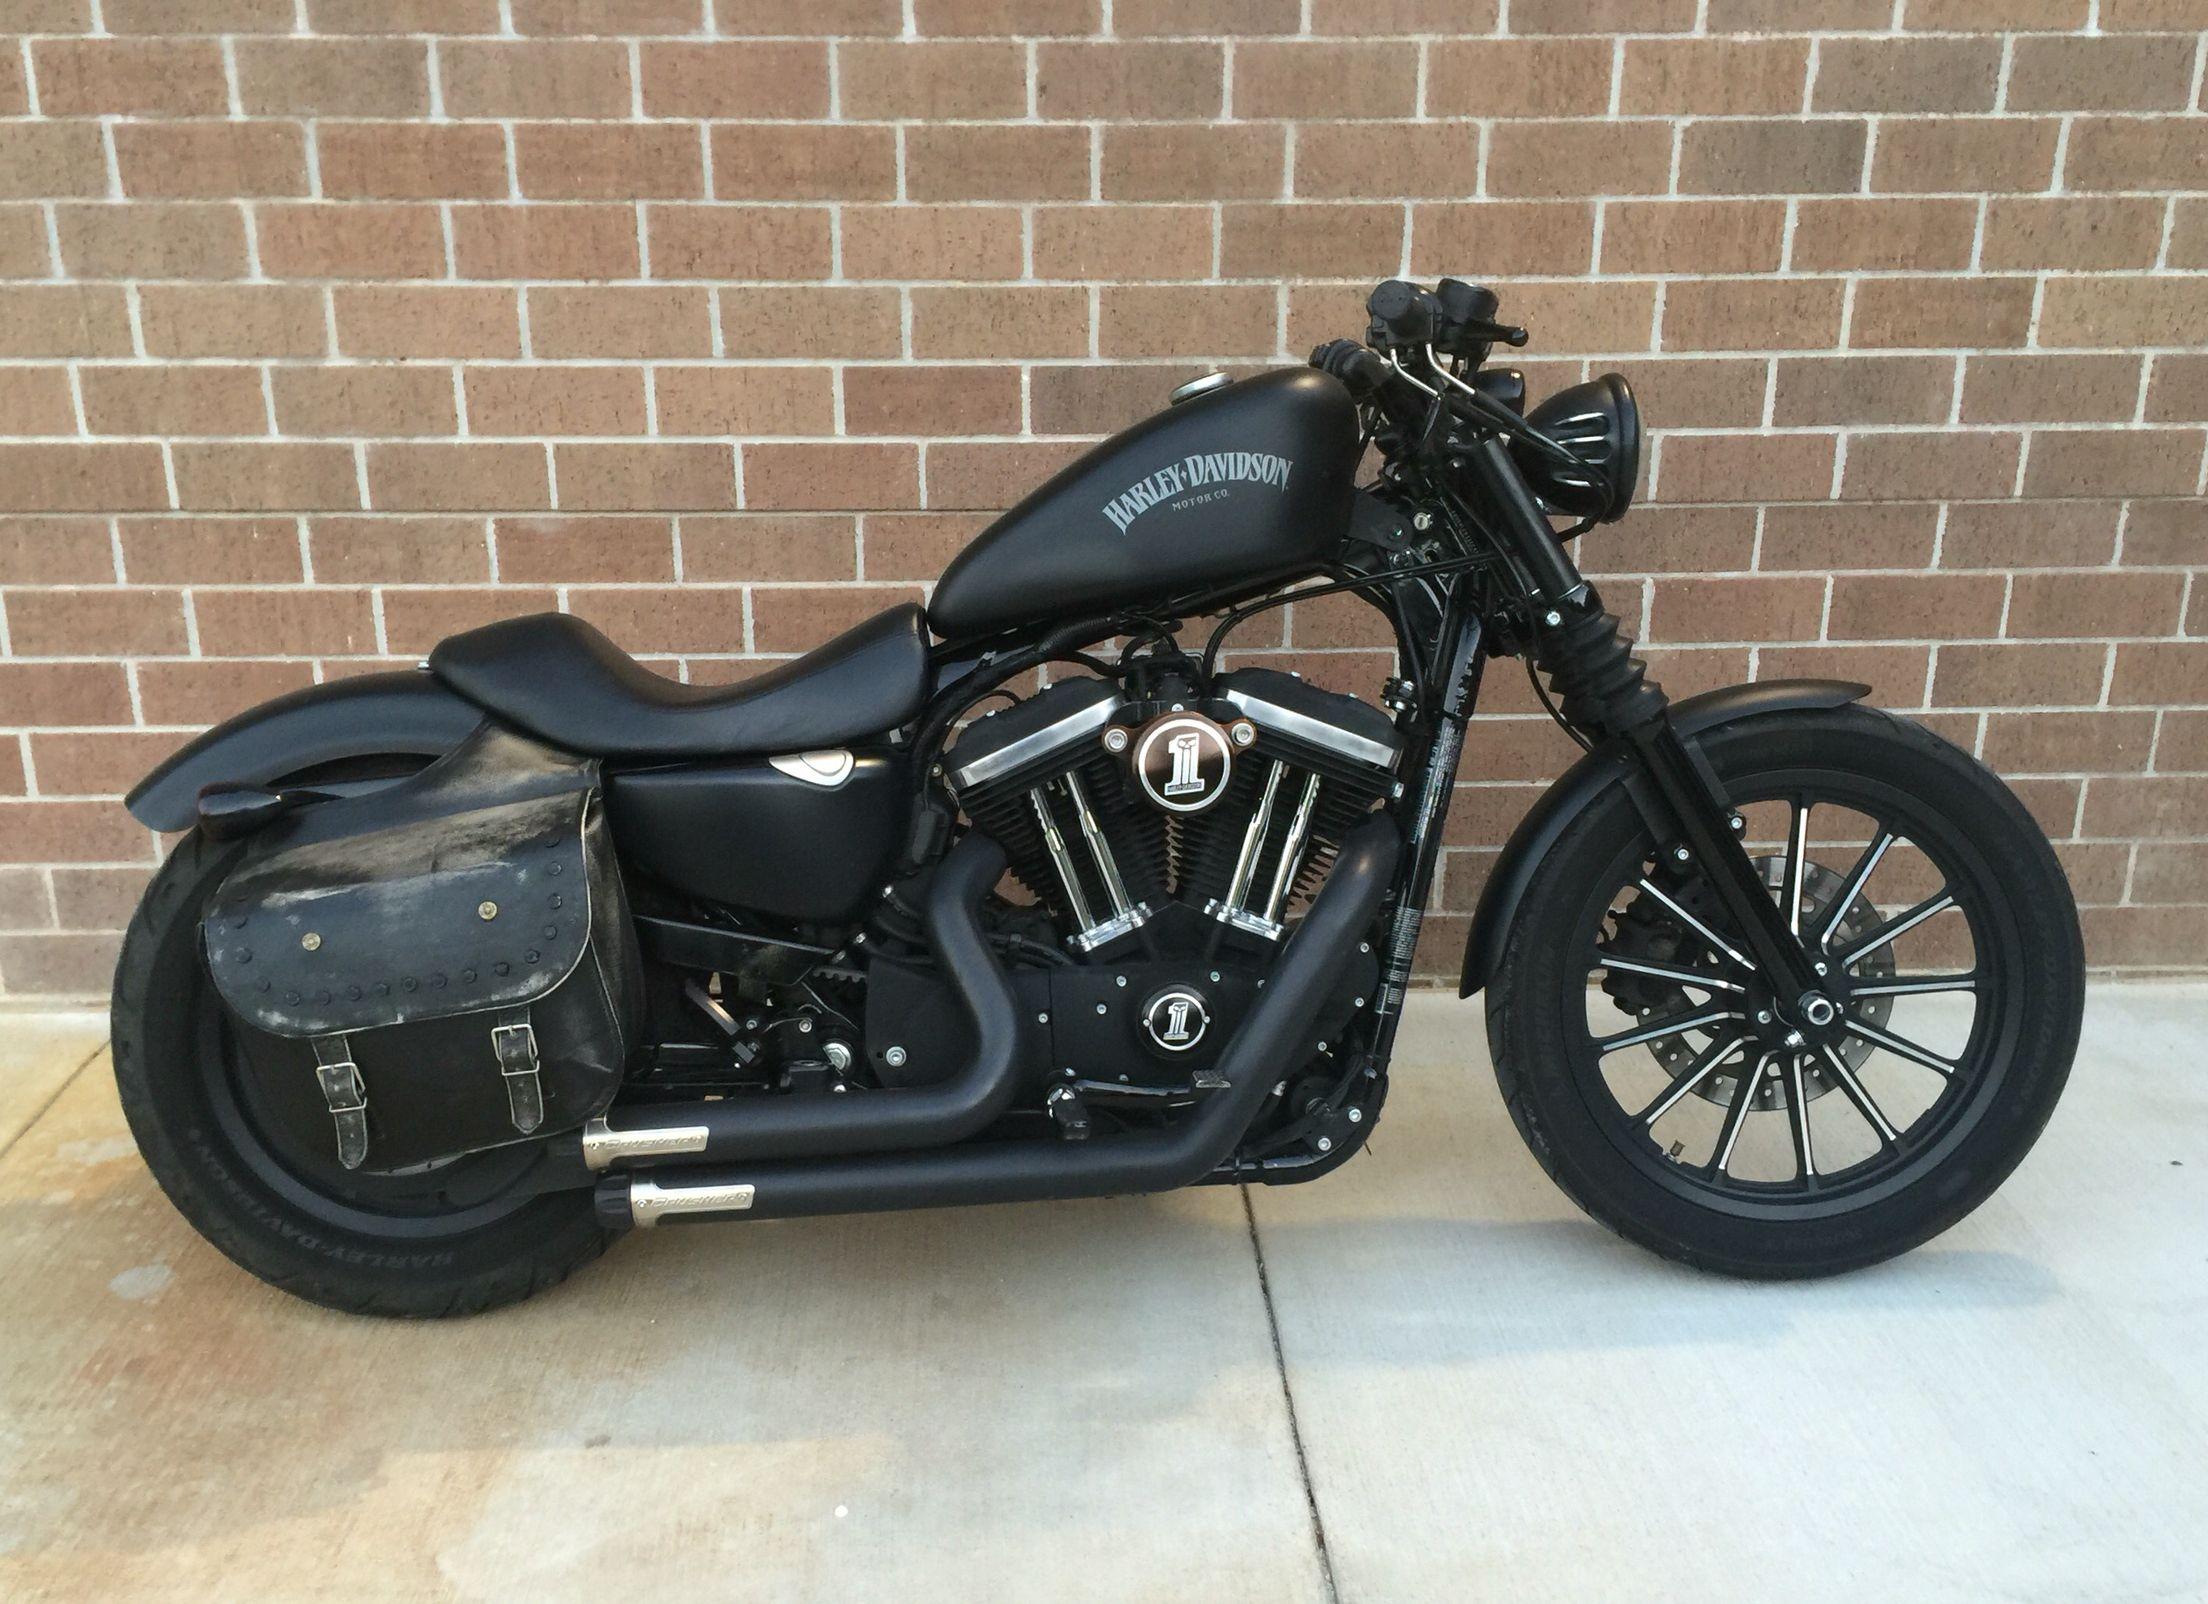 Harley Davidson Iron 883 my personal ride |#rumbleon #motorcycle #harleydavidson | Fulfilling